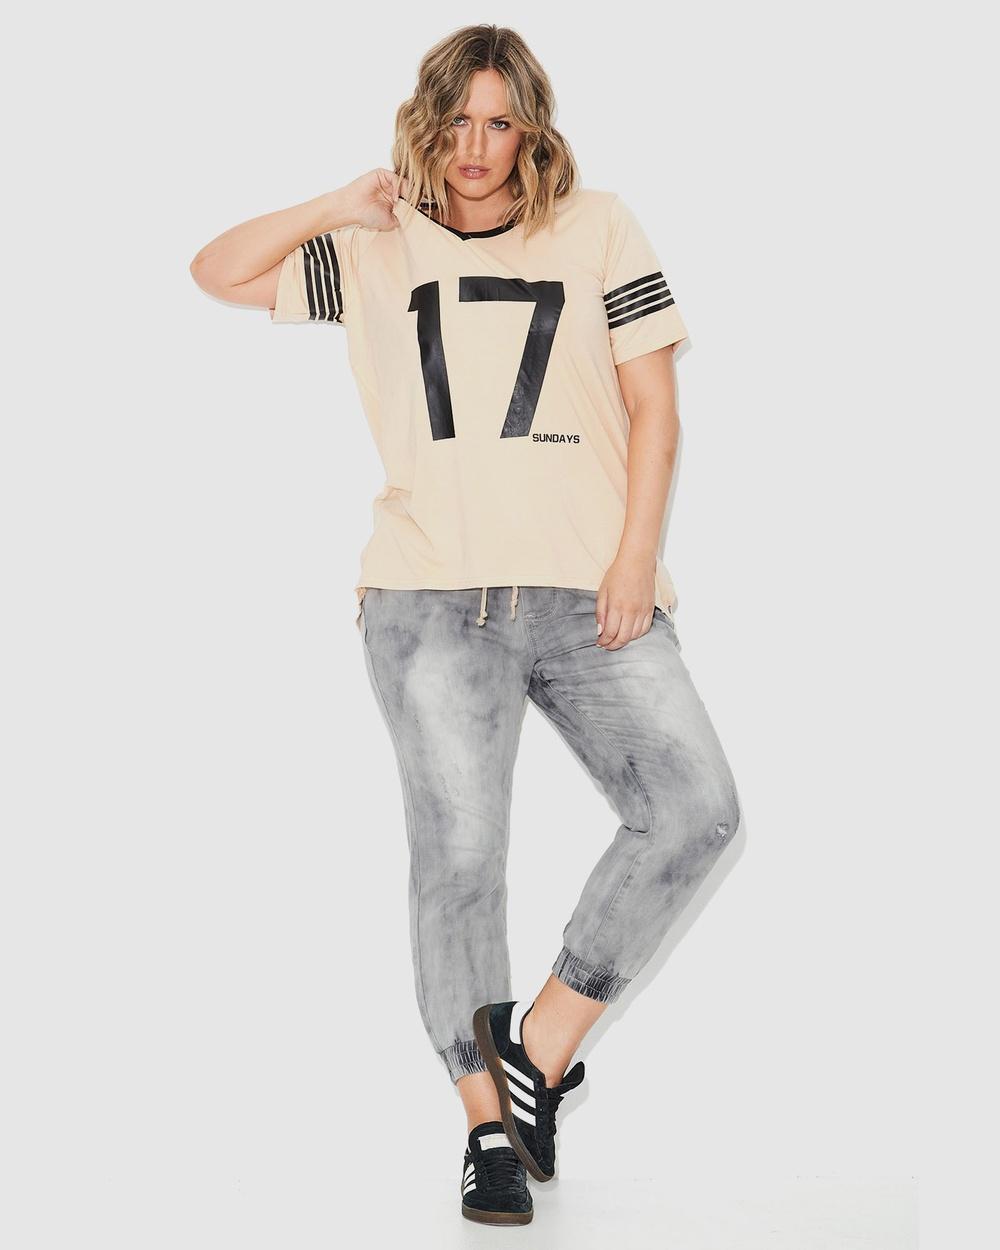 17 Sundays Retro Sports Tee Short Sleeve T-Shirts Natural